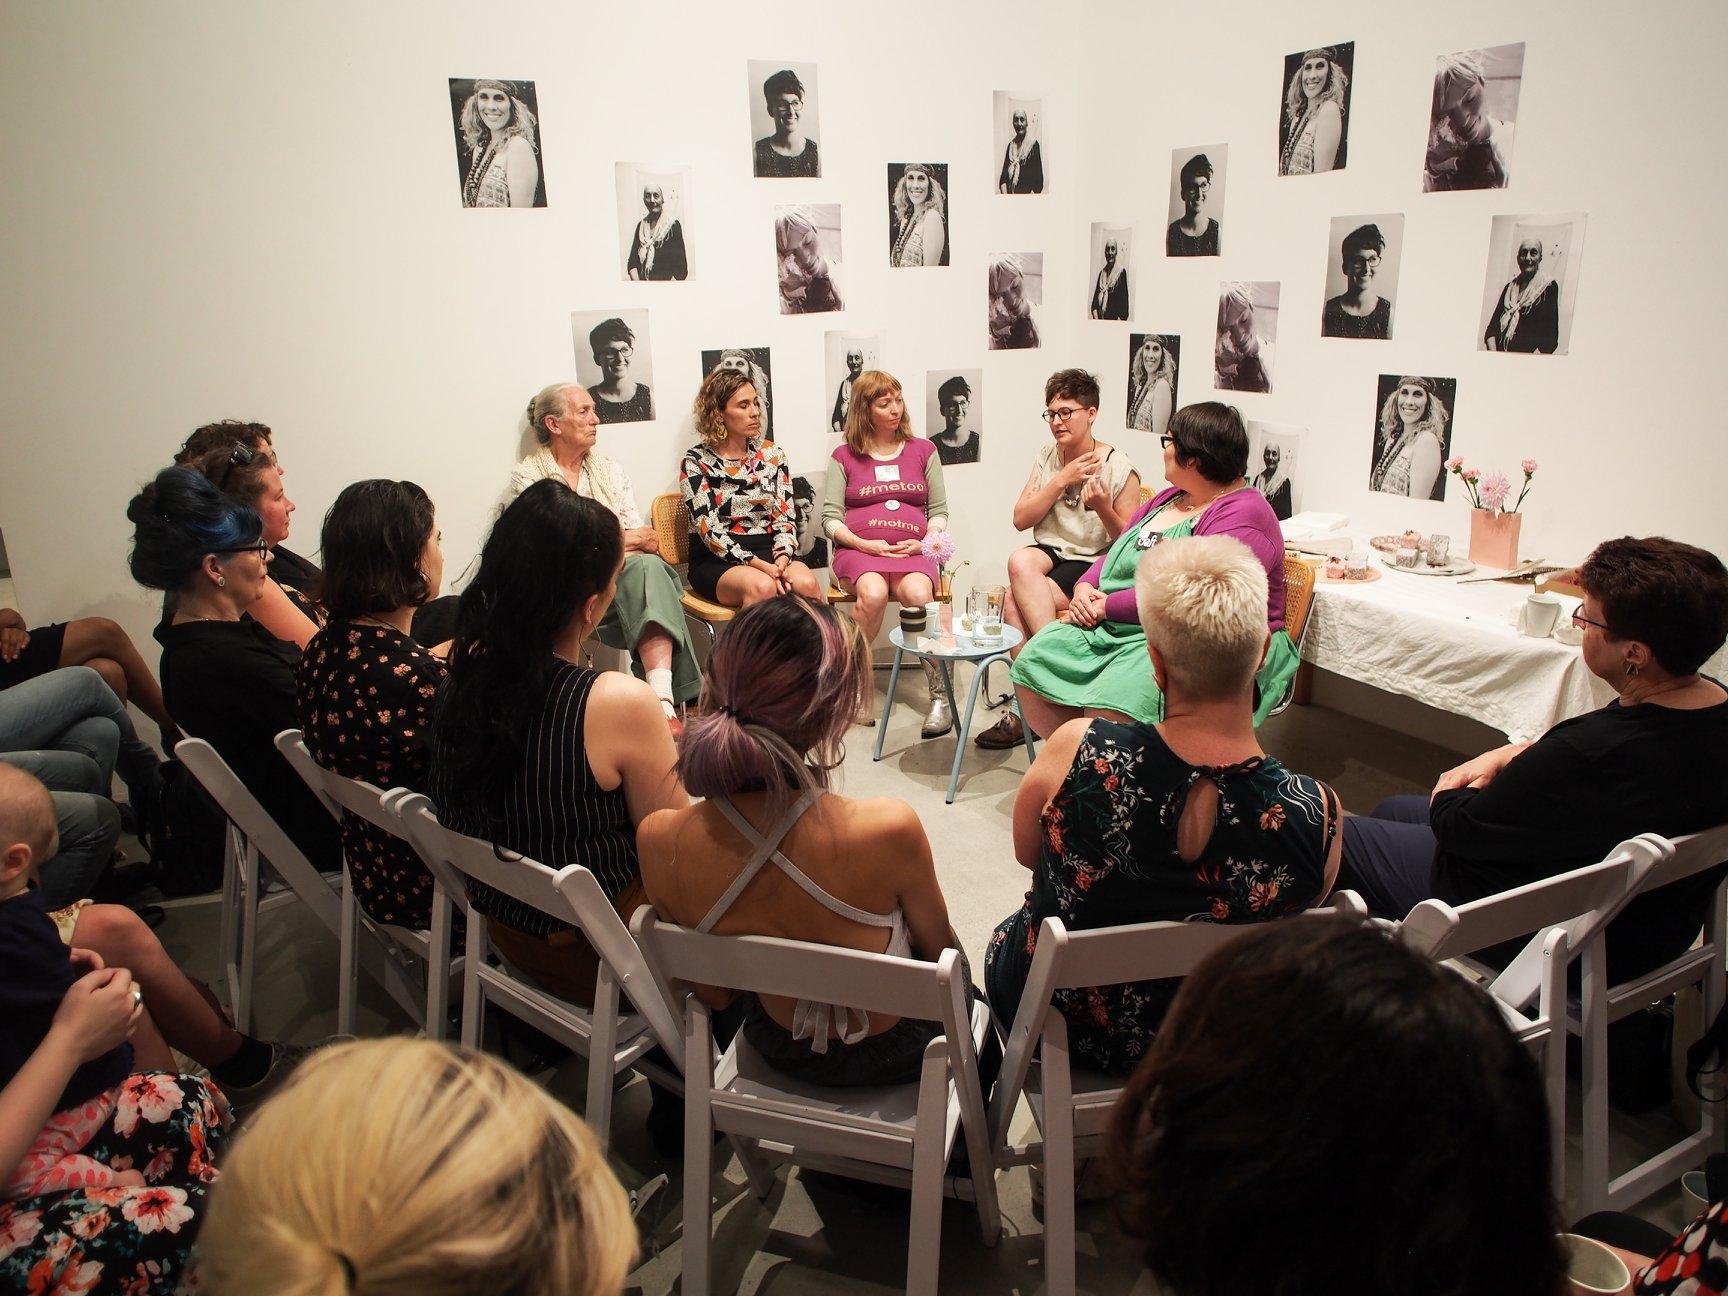 Craft Victoria, International Women's Day: Tea and Conversation, 2018. L - R, Jane Badger, Laura Thompson, Casey Jenkins, Anna Dunnill and Gemma Jones. Photography Eliza Tiernan